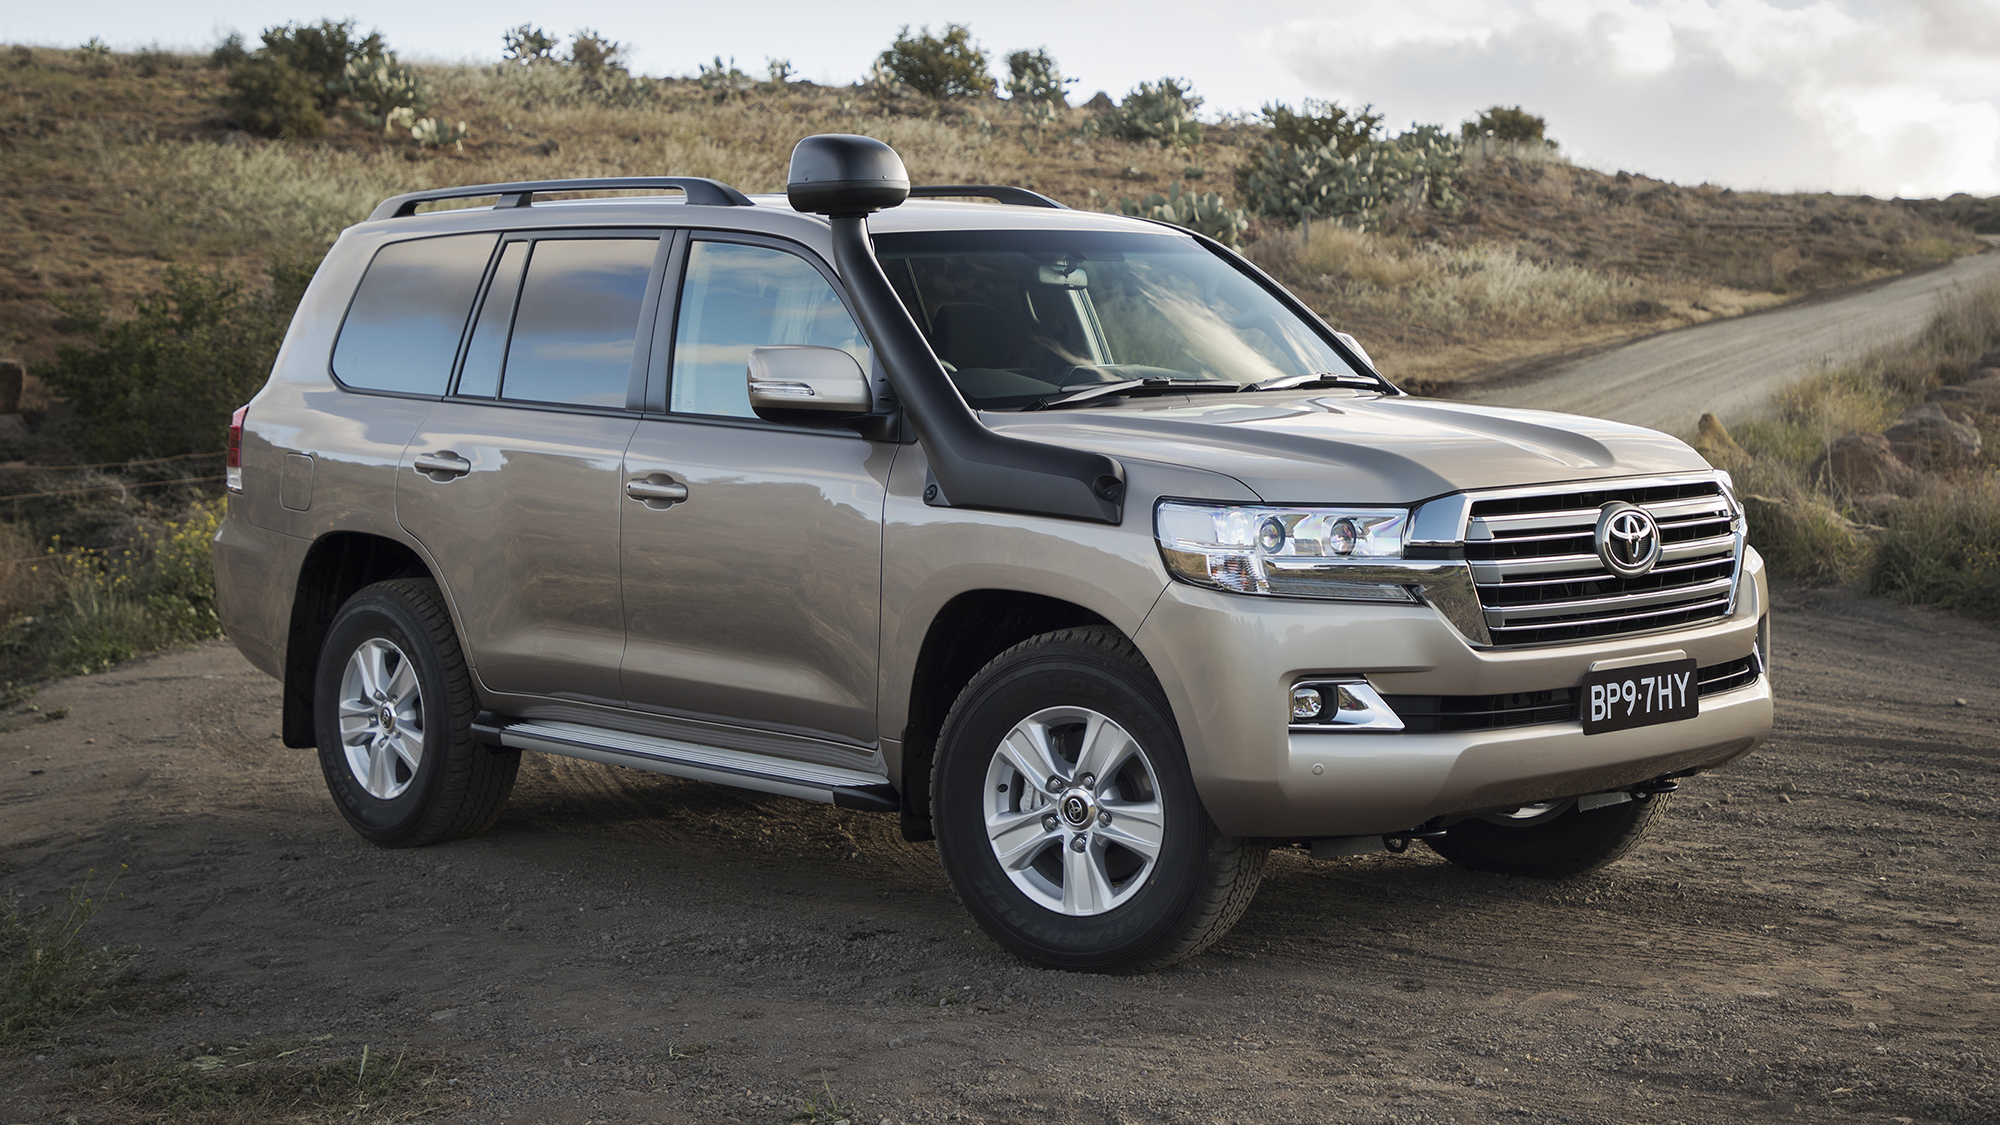 2019 Toyota LandCruiser 200 Series upgrades announced – UPDATE